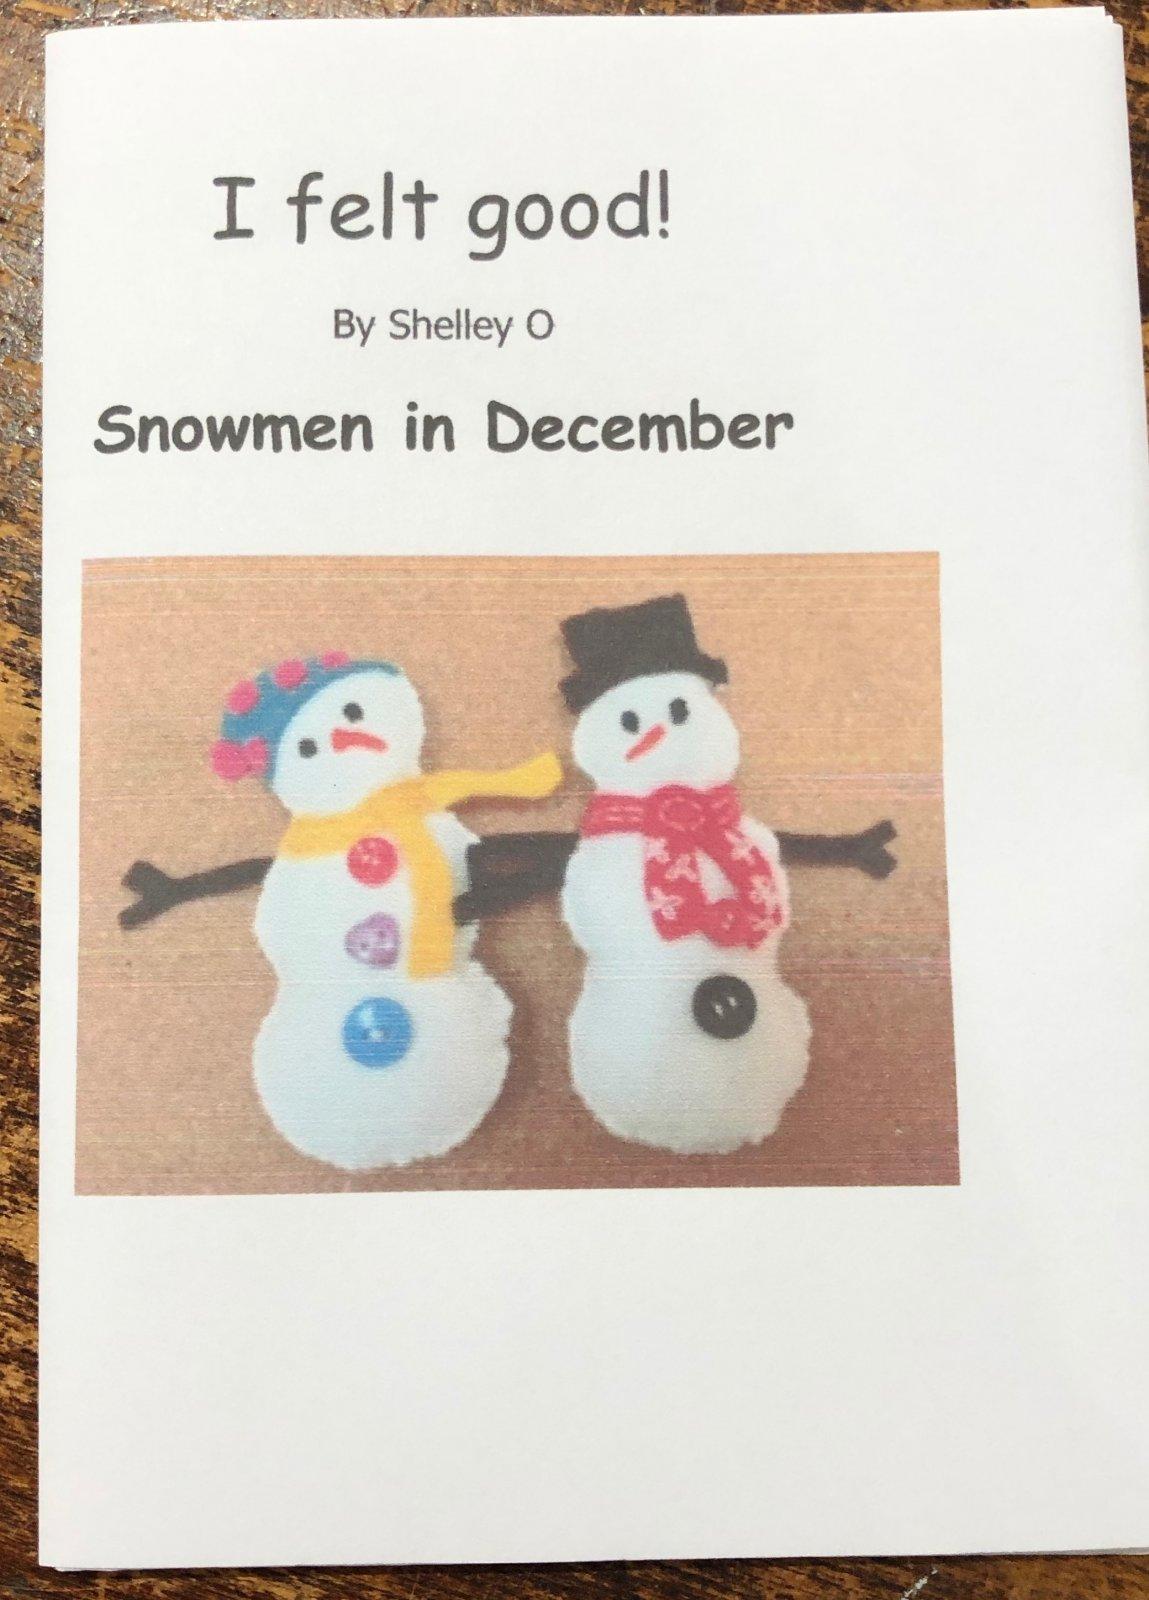 Snowmen in December